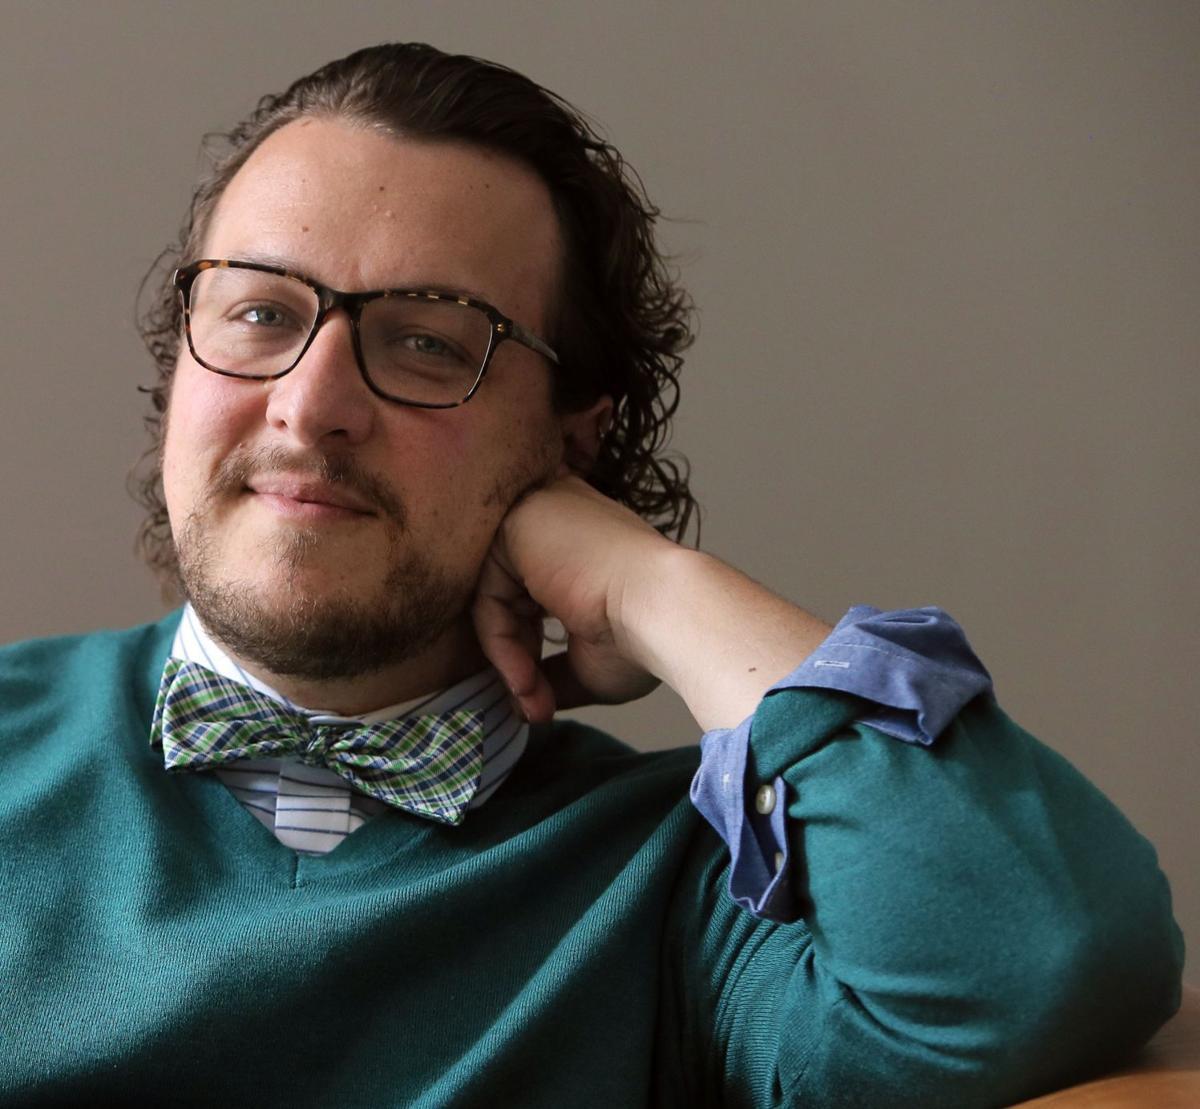 Portrait of Ryan Thomas Neace